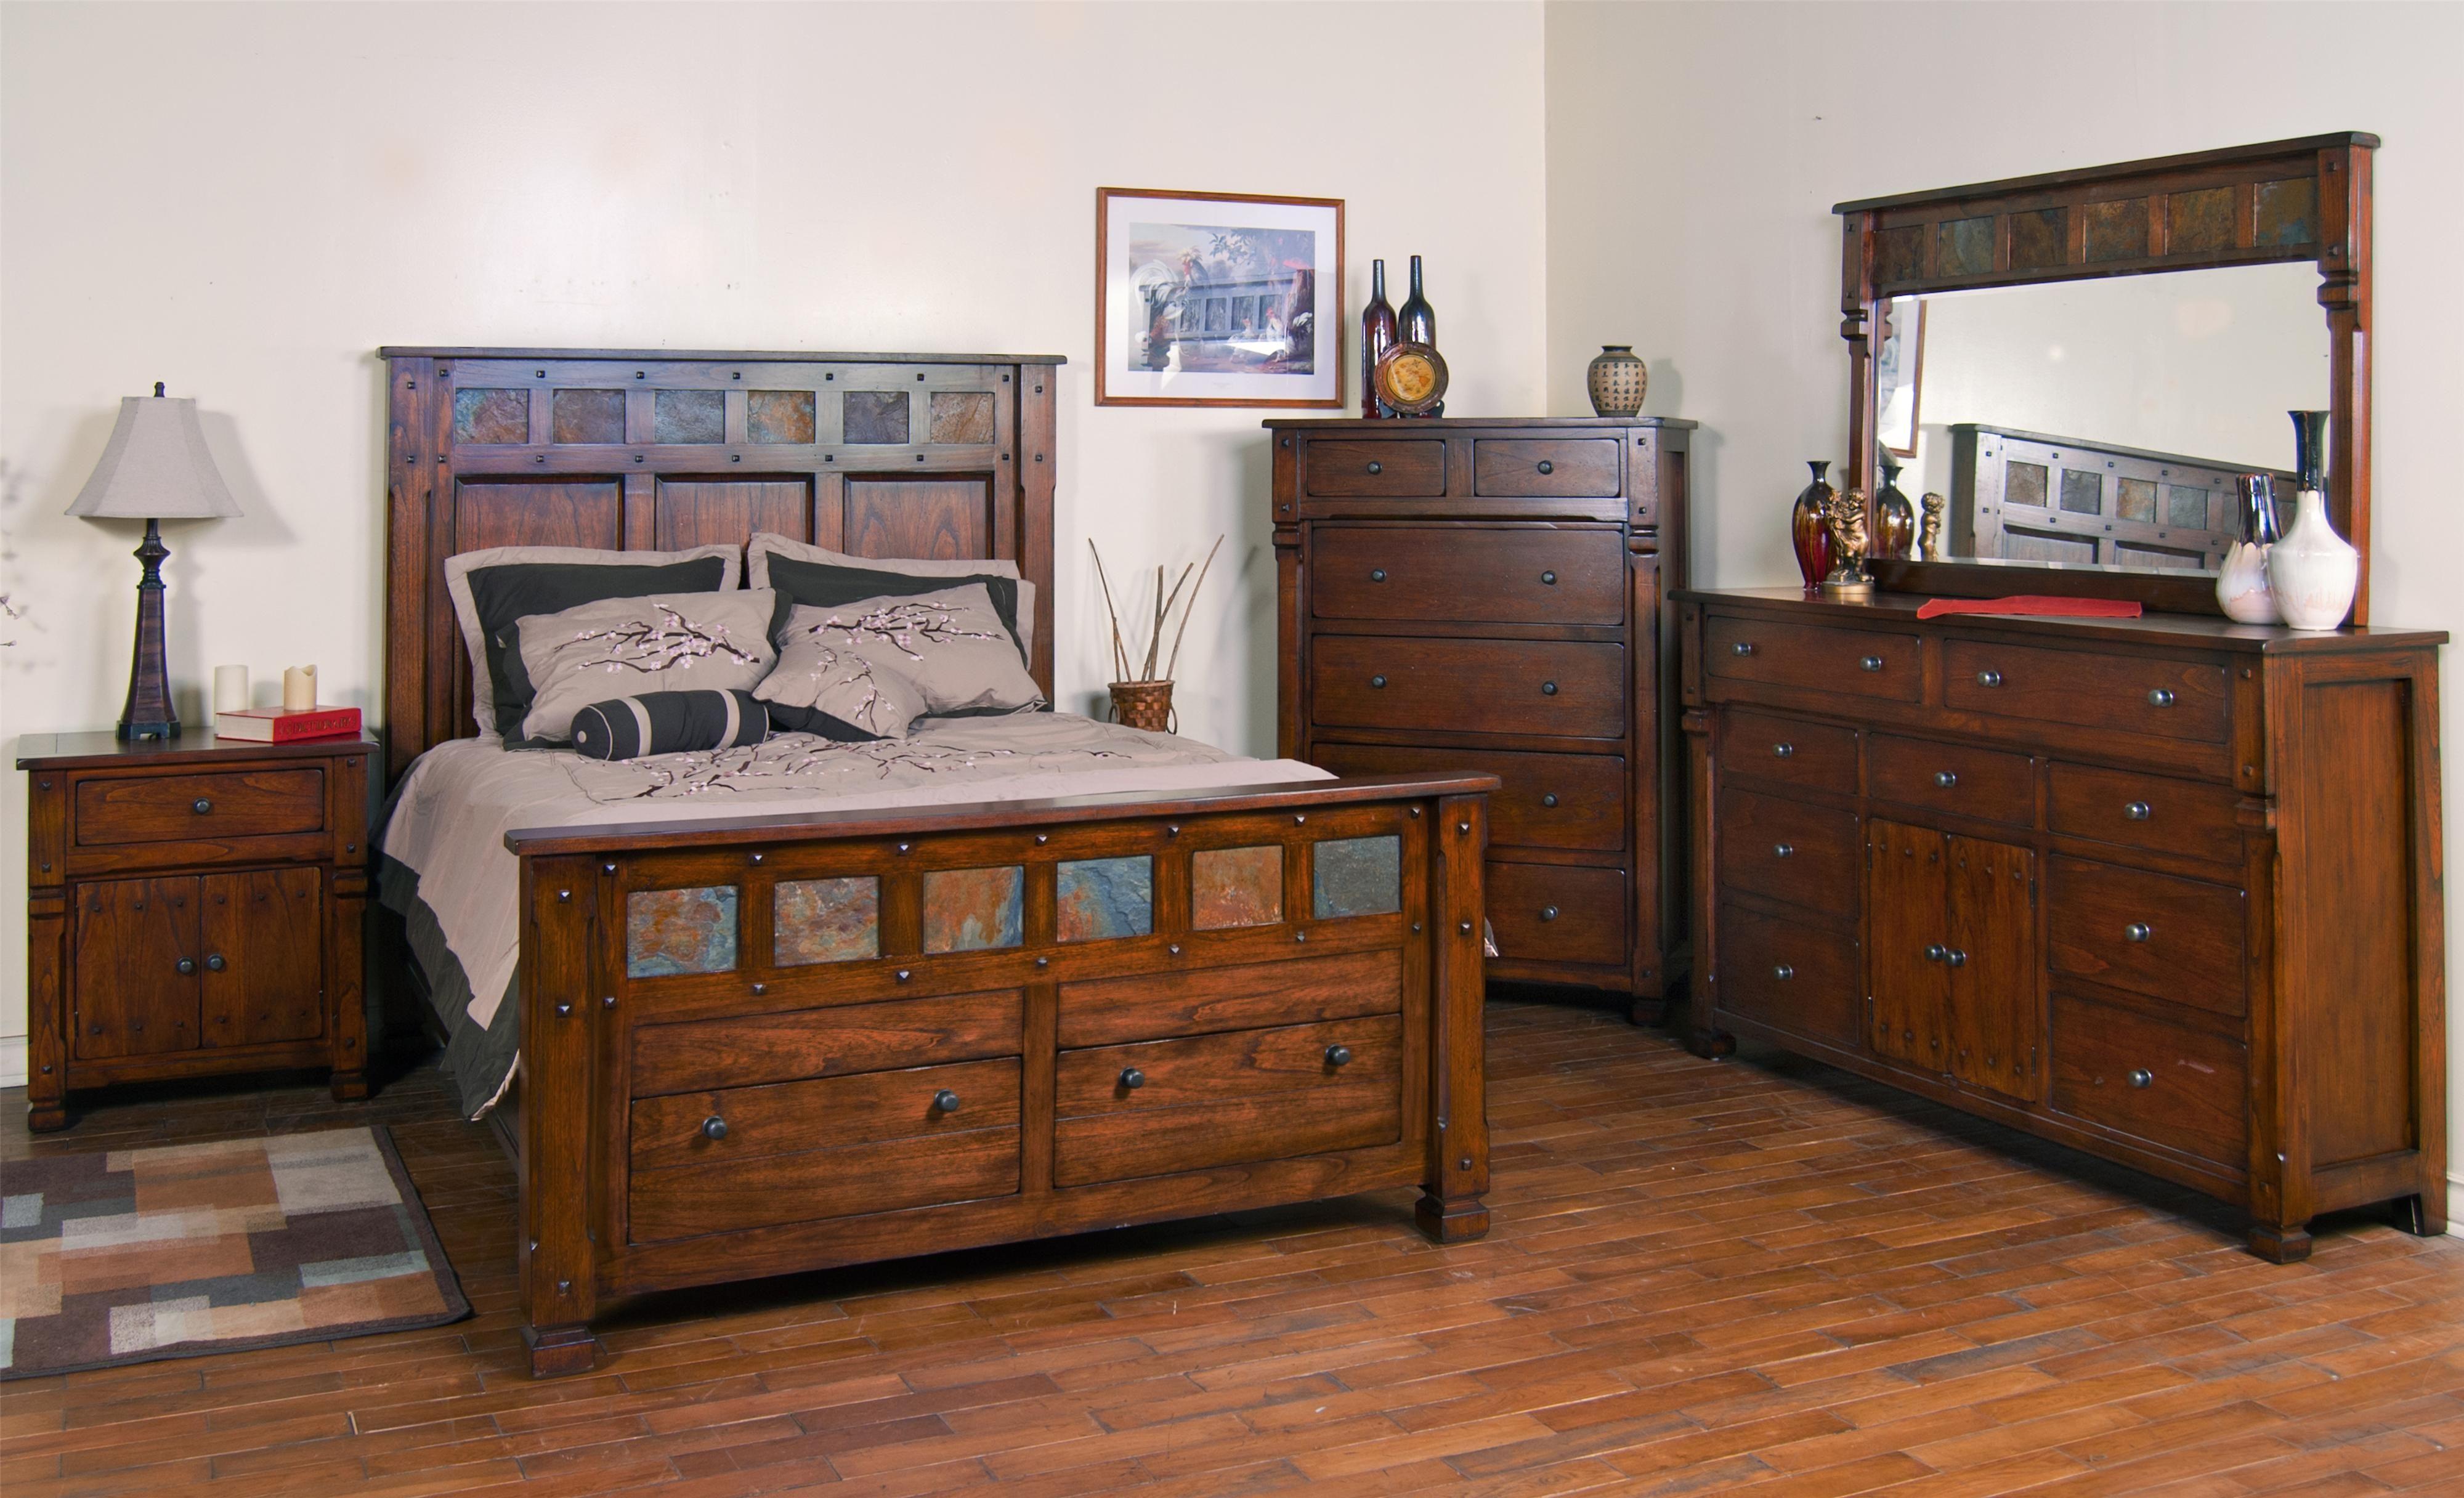 Sunny Designs Furniture: Santa Fe Bedroom Collection ...